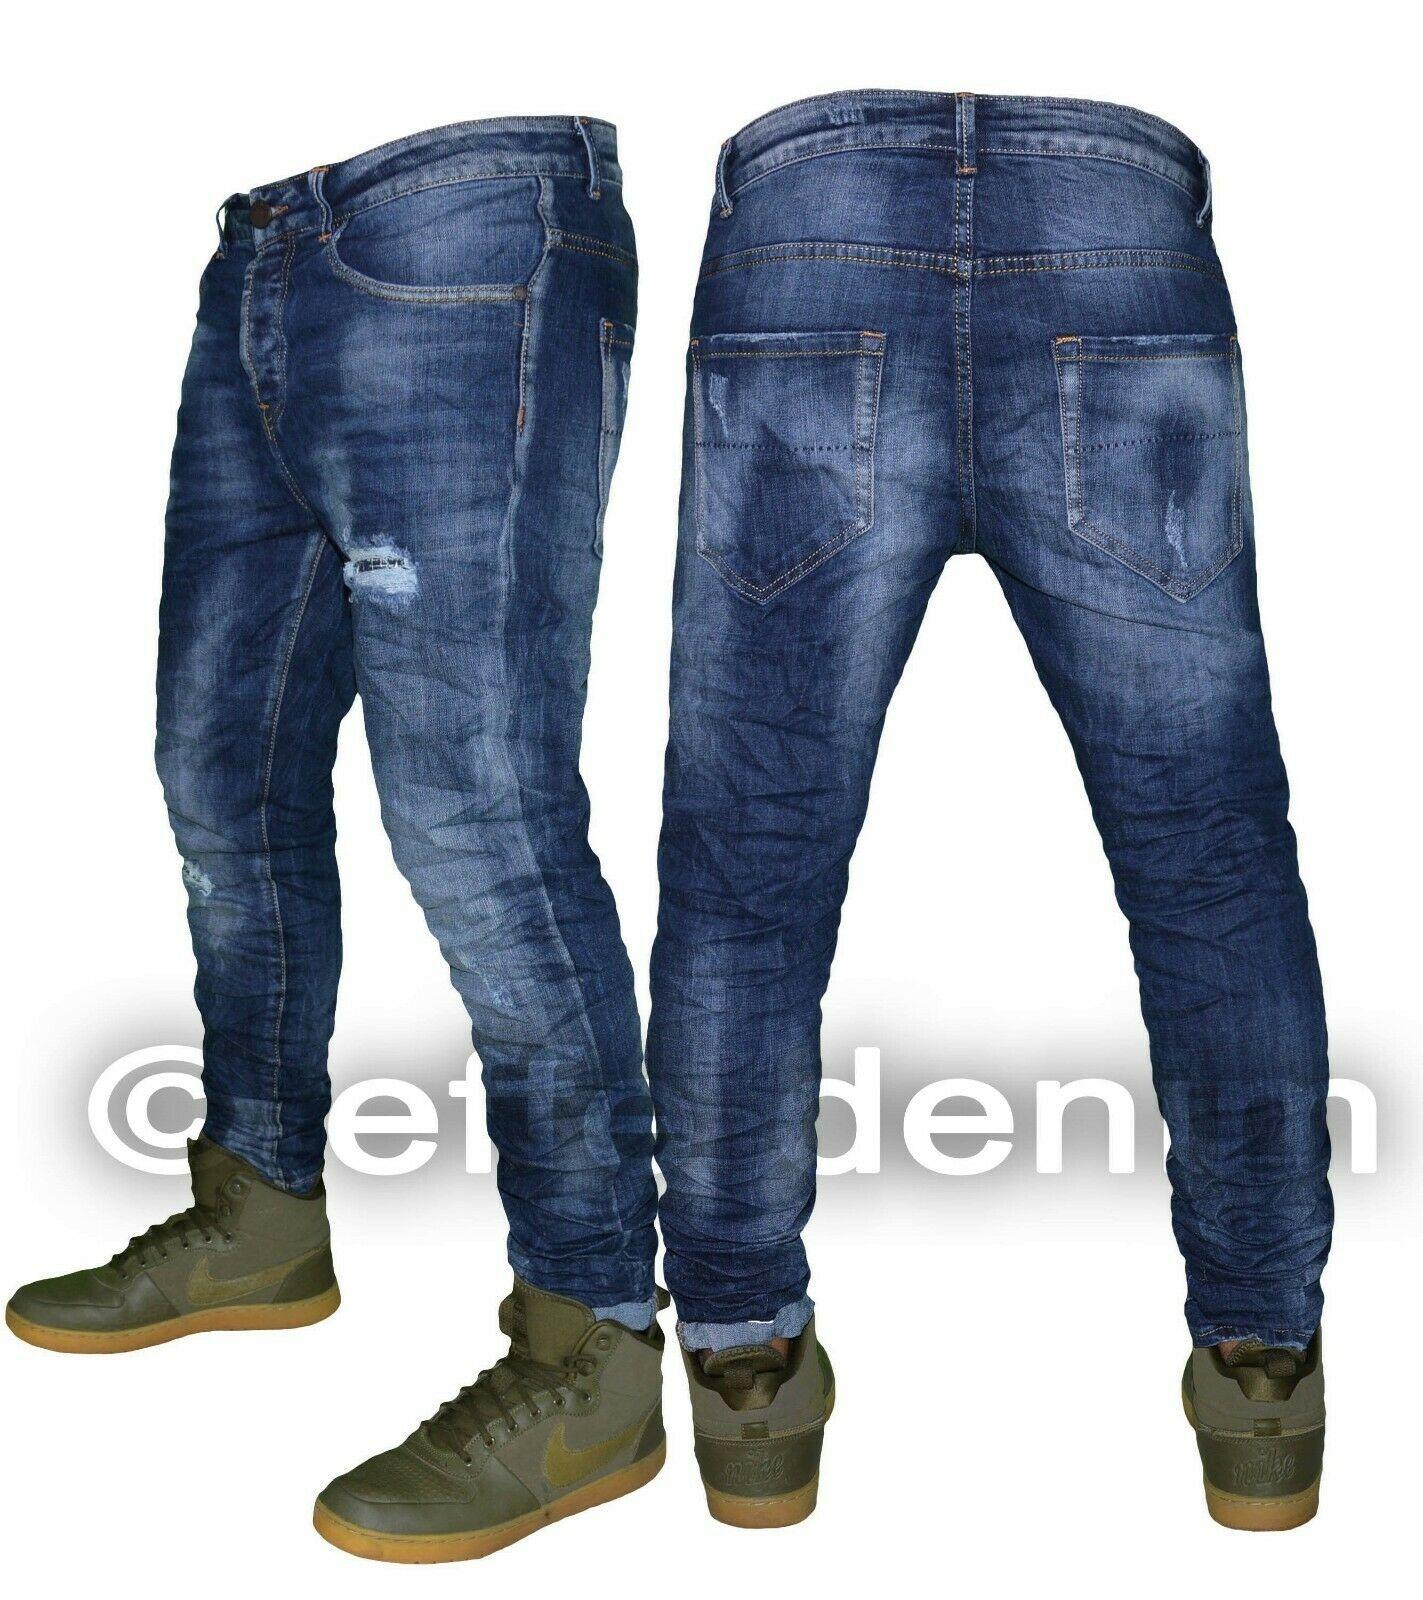 Jeans uomo Denim strappati slim fit pantaloni Blu elasticizzati nuovo 1390